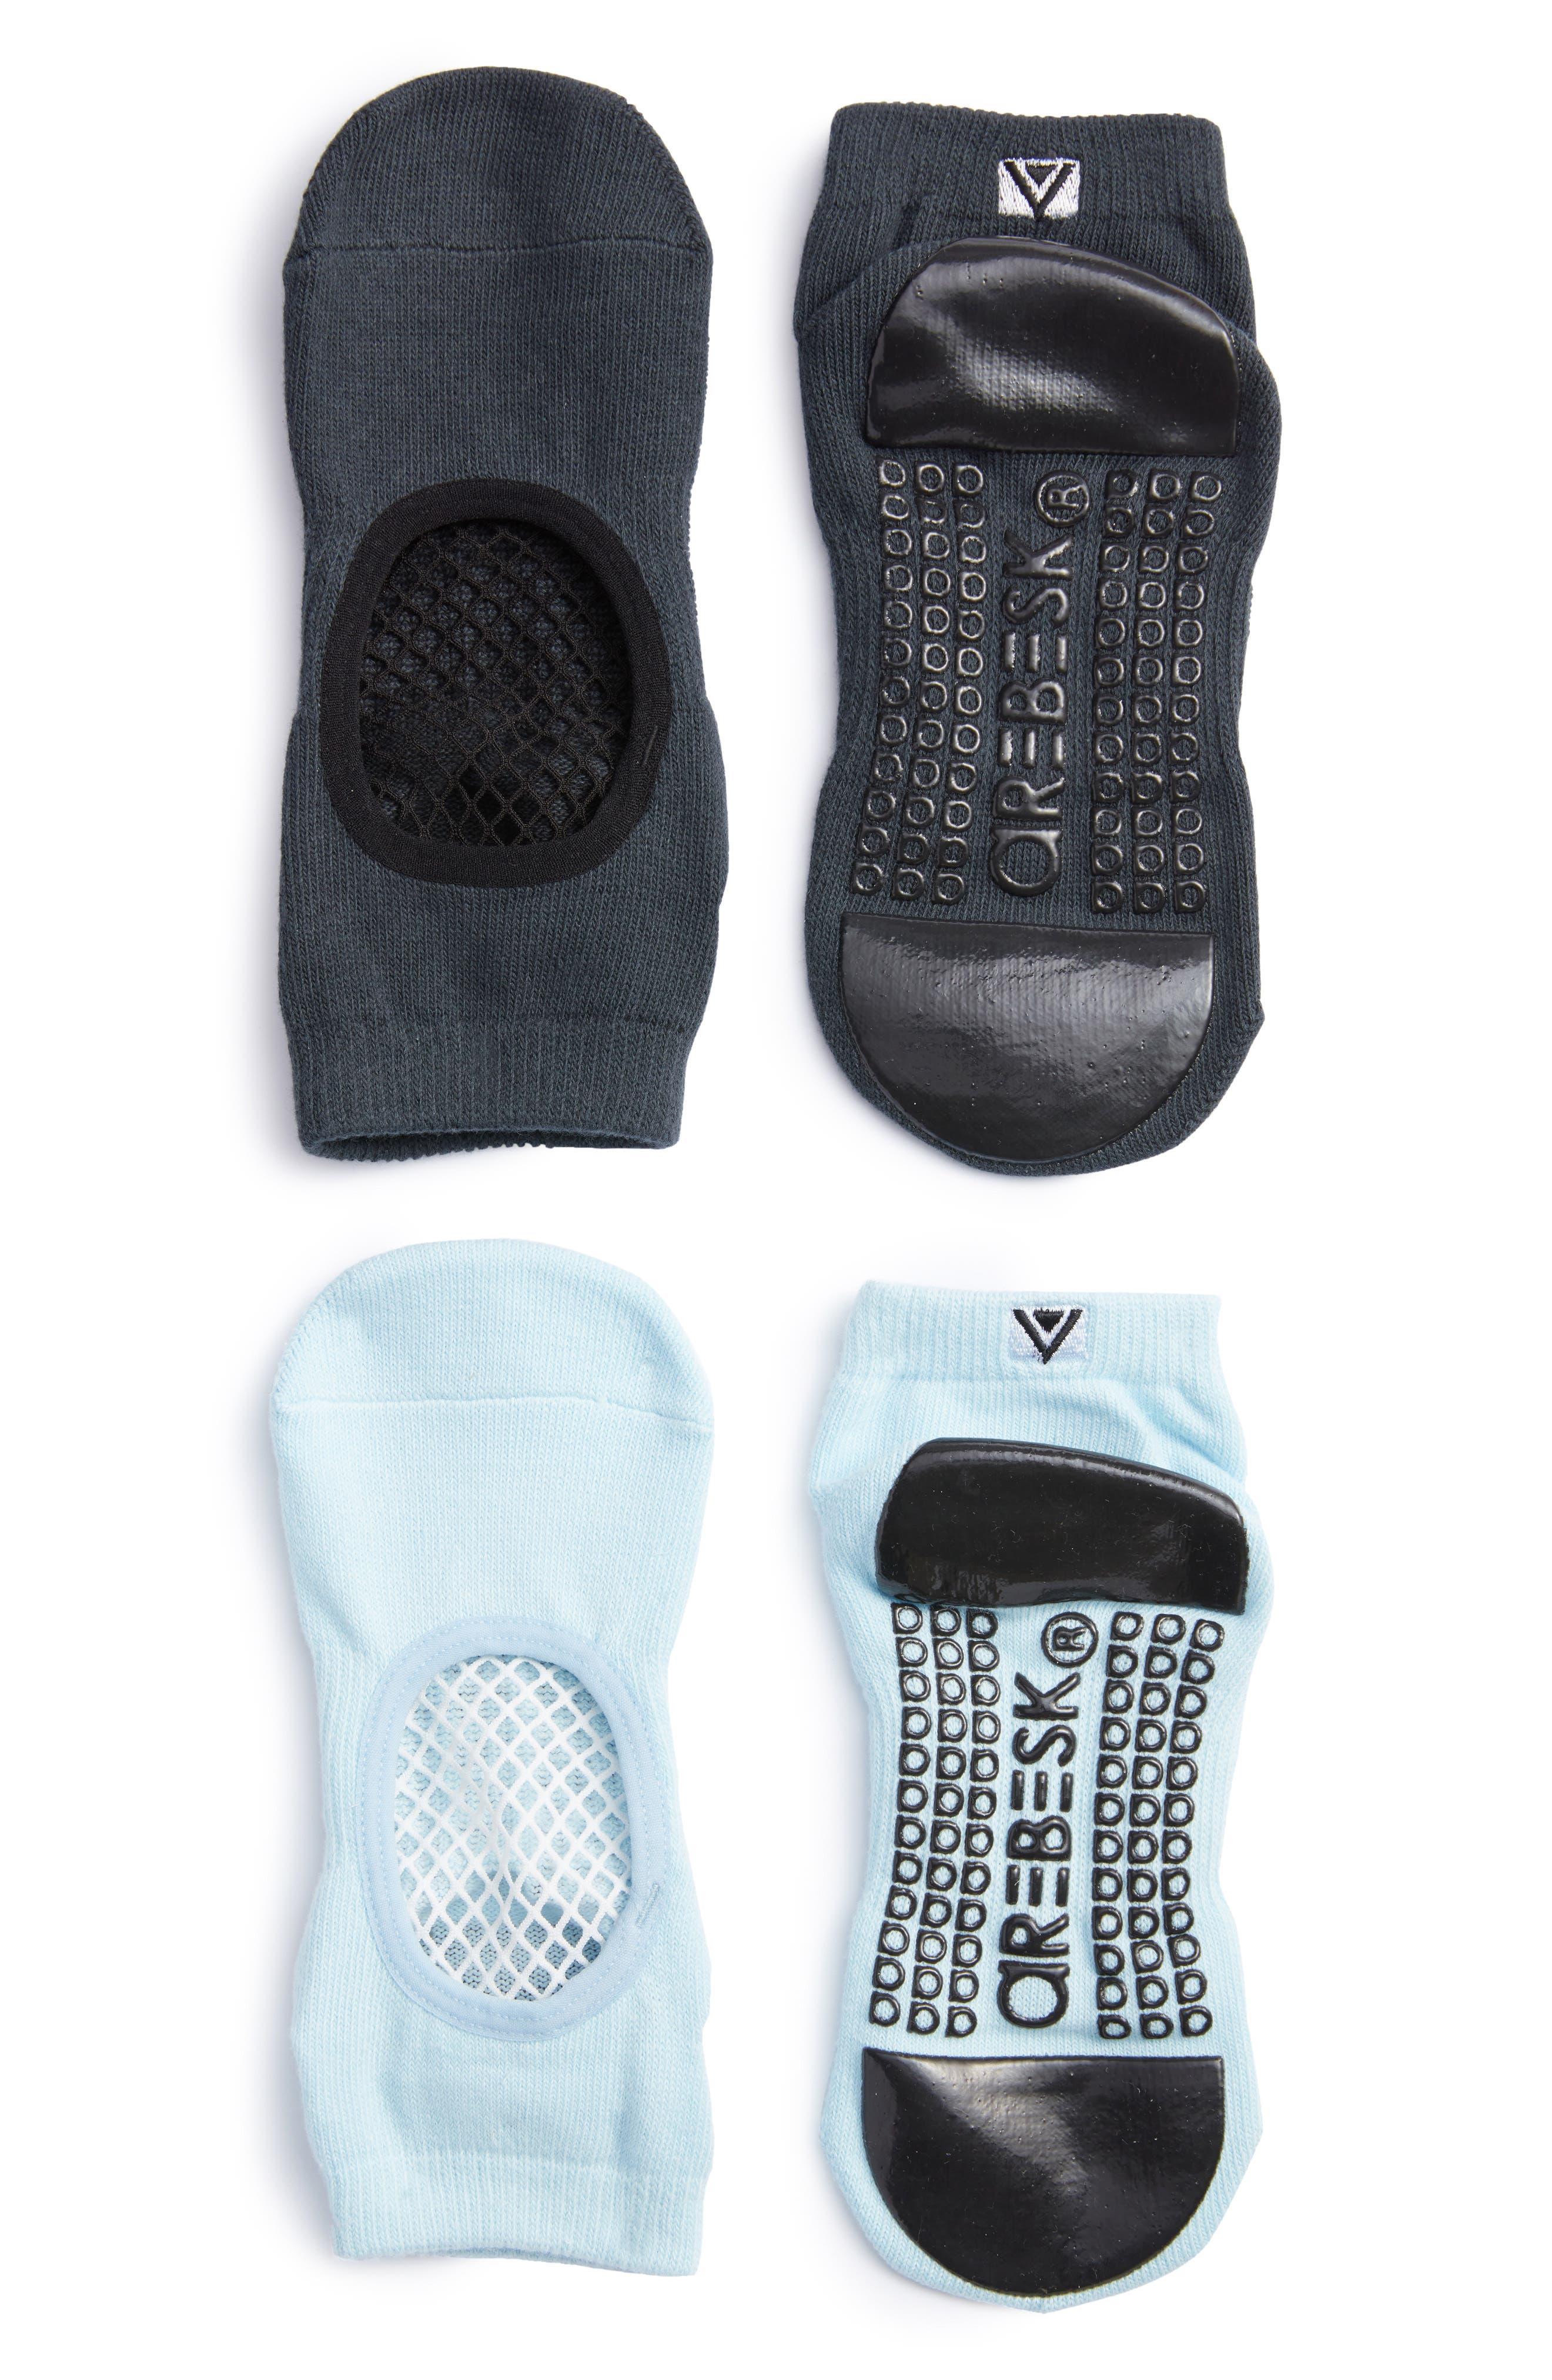 Phish Net Assorted 2-Pack No-Slip Socks